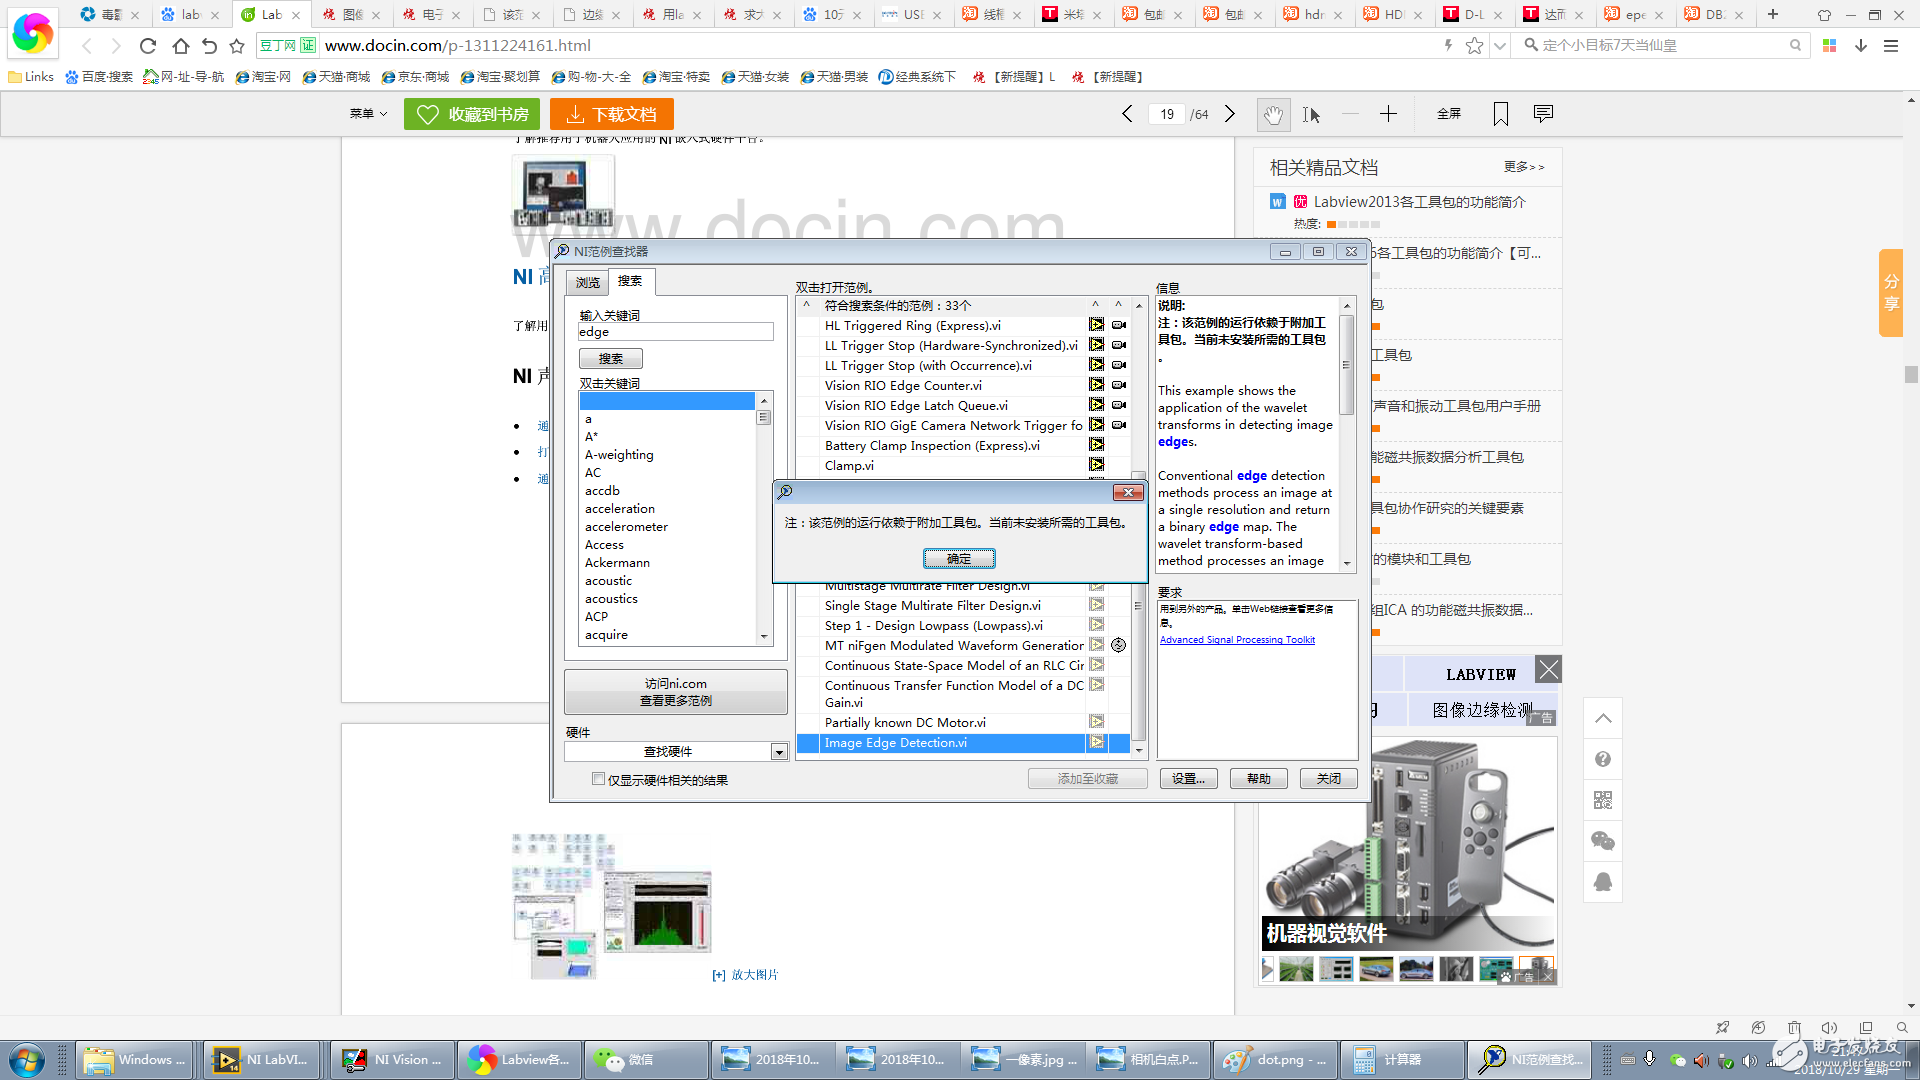 labview  ni vision ,请问一下, 打开这个范例需要添加什么附加工具包